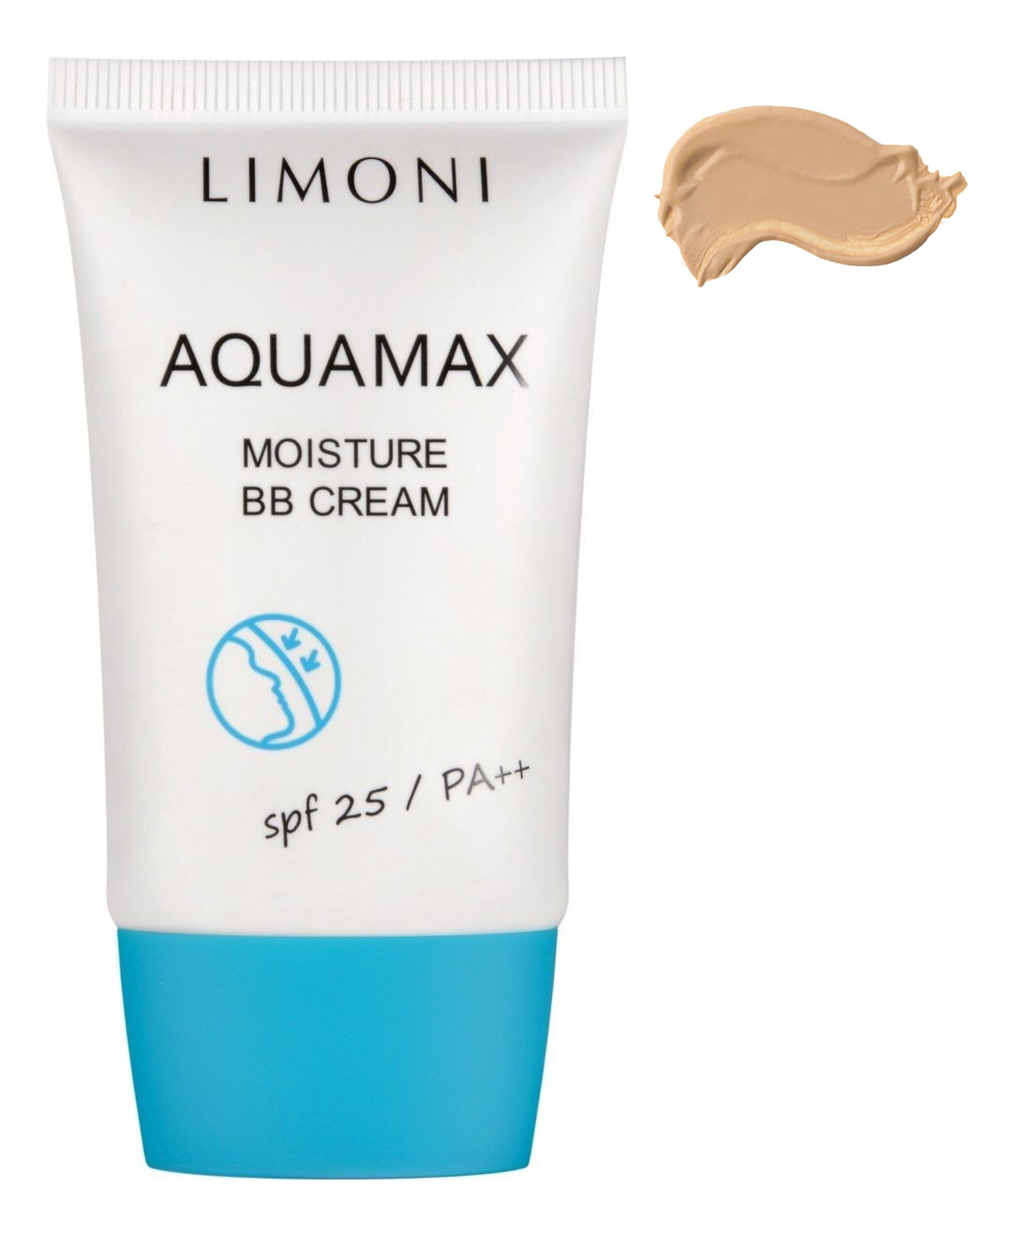 Купить BB крем для лица увлажняющий Aquamax Moisture Cream SPF25 PA++ 40мл: No 2, Limoni